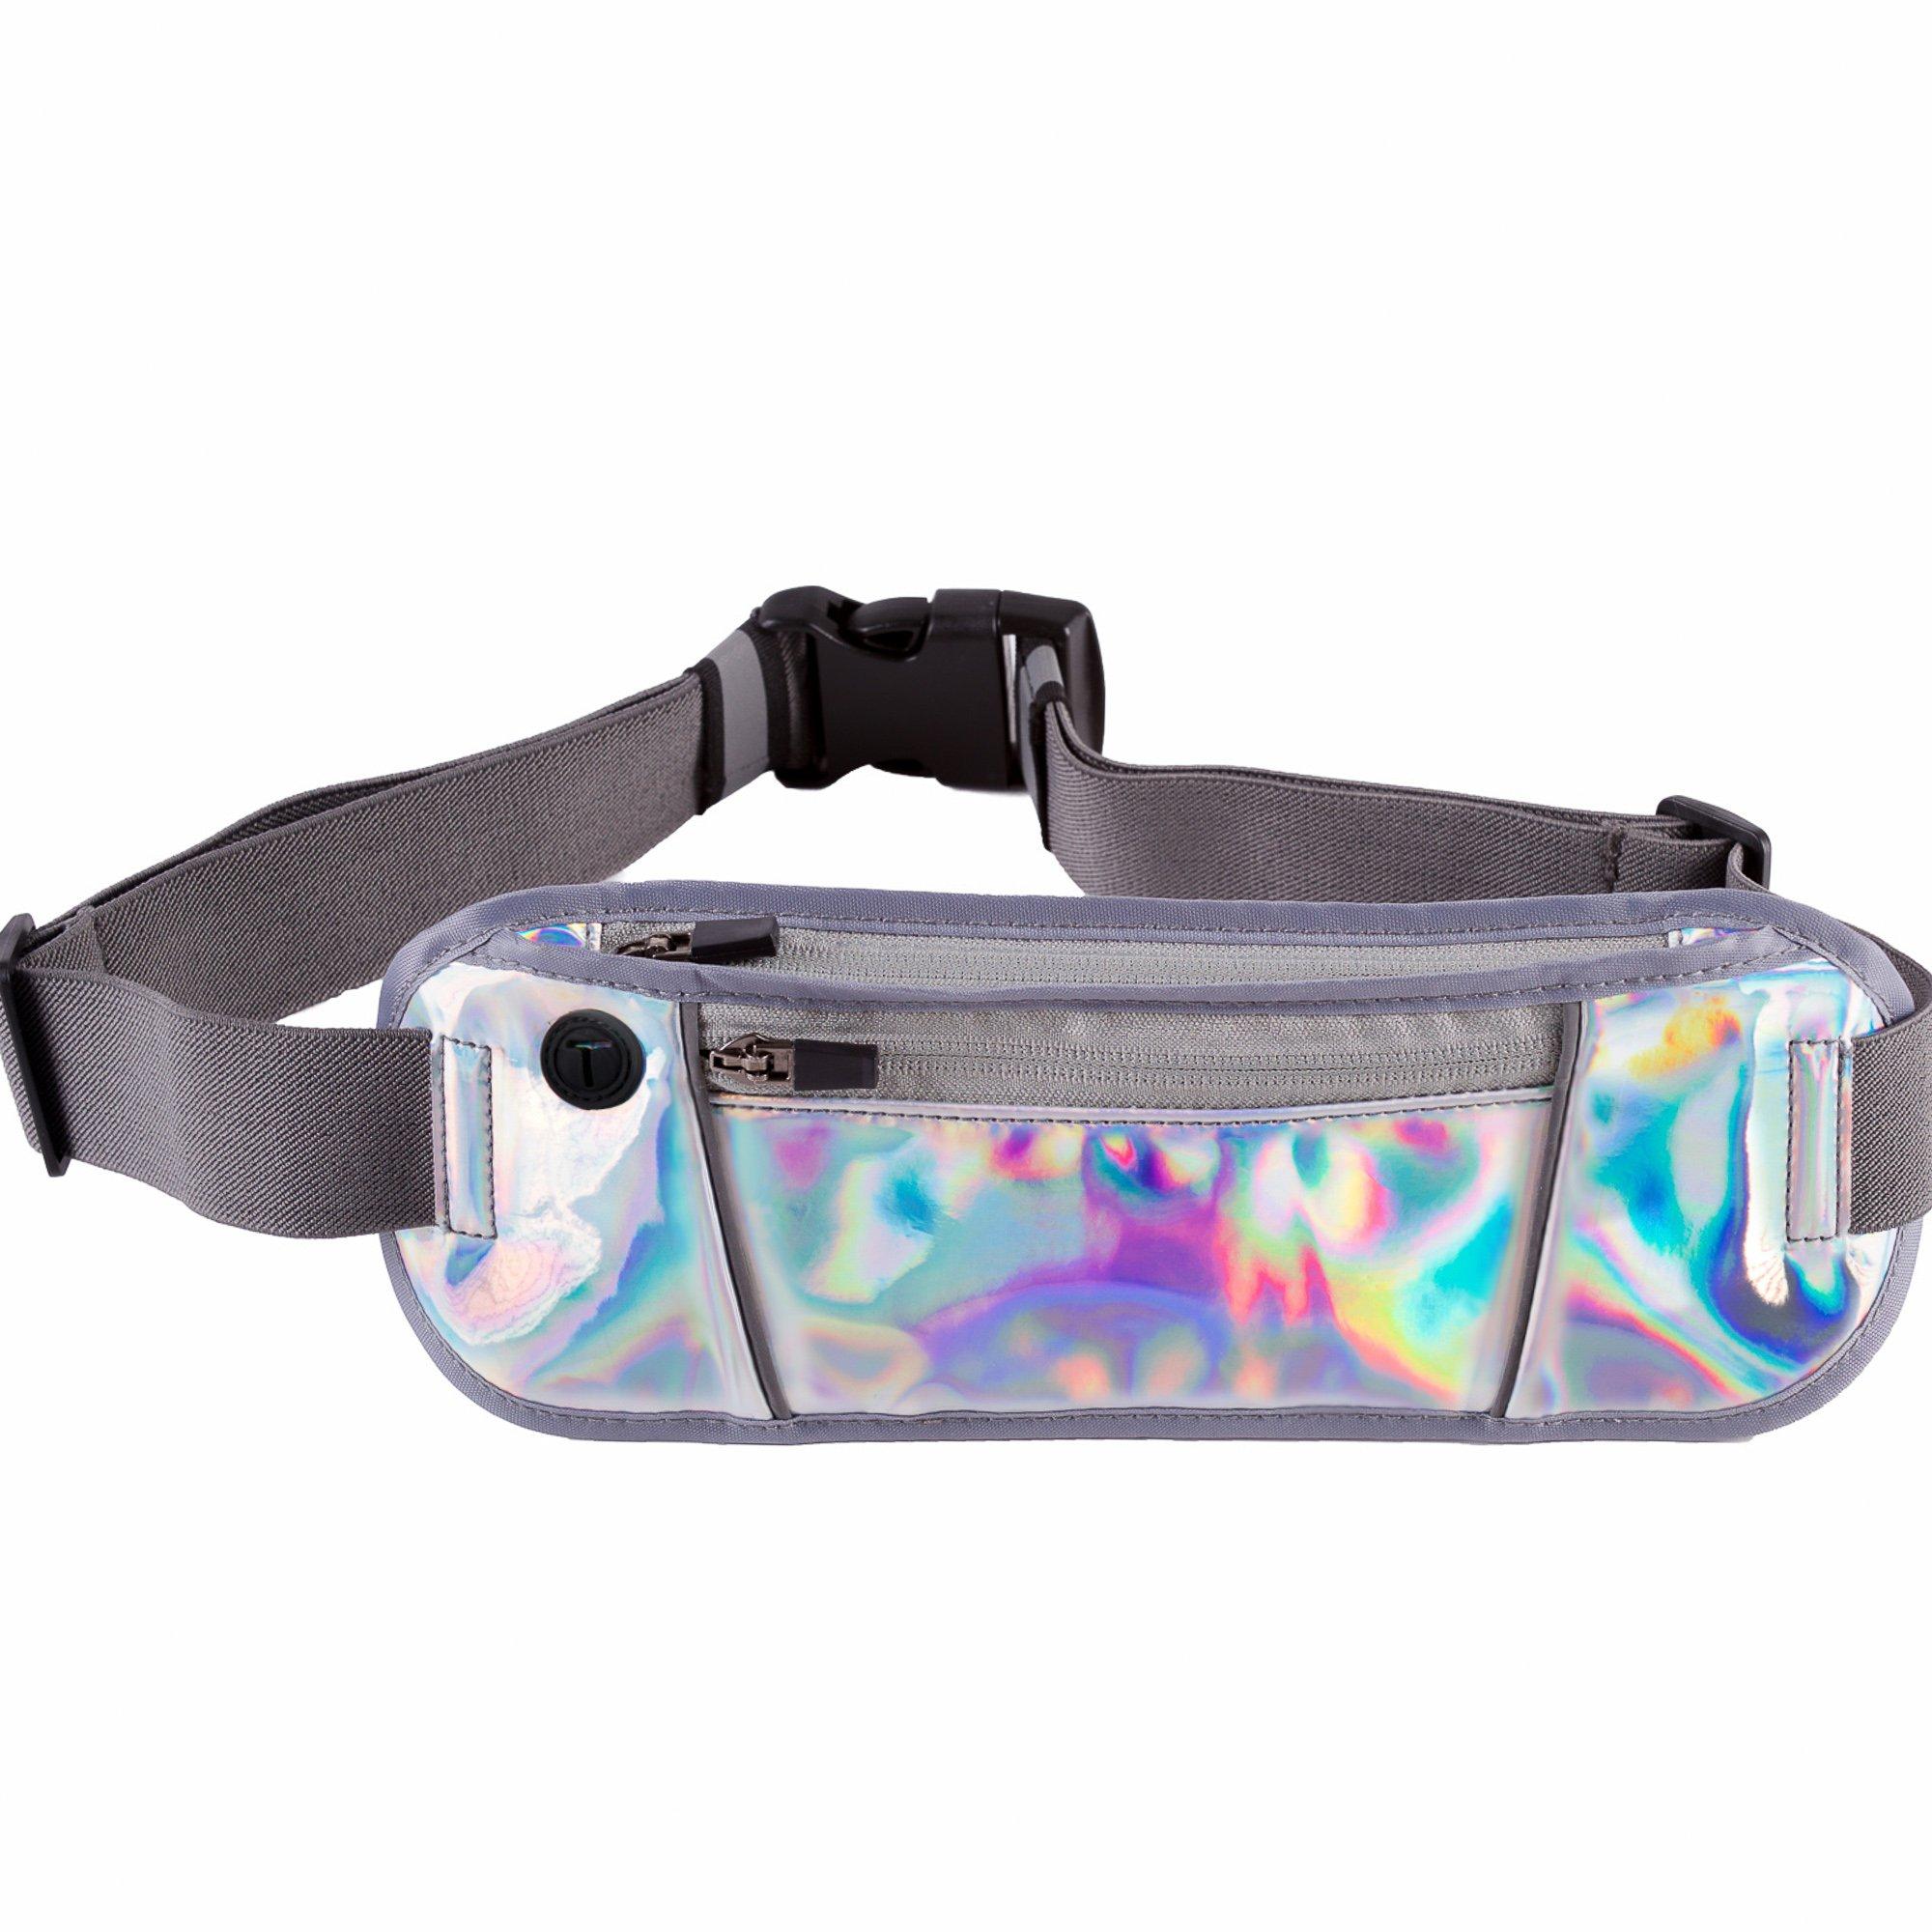 Vizhora Holographic Fanny Pack for Women – Best for Festival, Rave, Travel, Running. Neon Water Resistant Shiny Waist Bum Bag by Vizhora